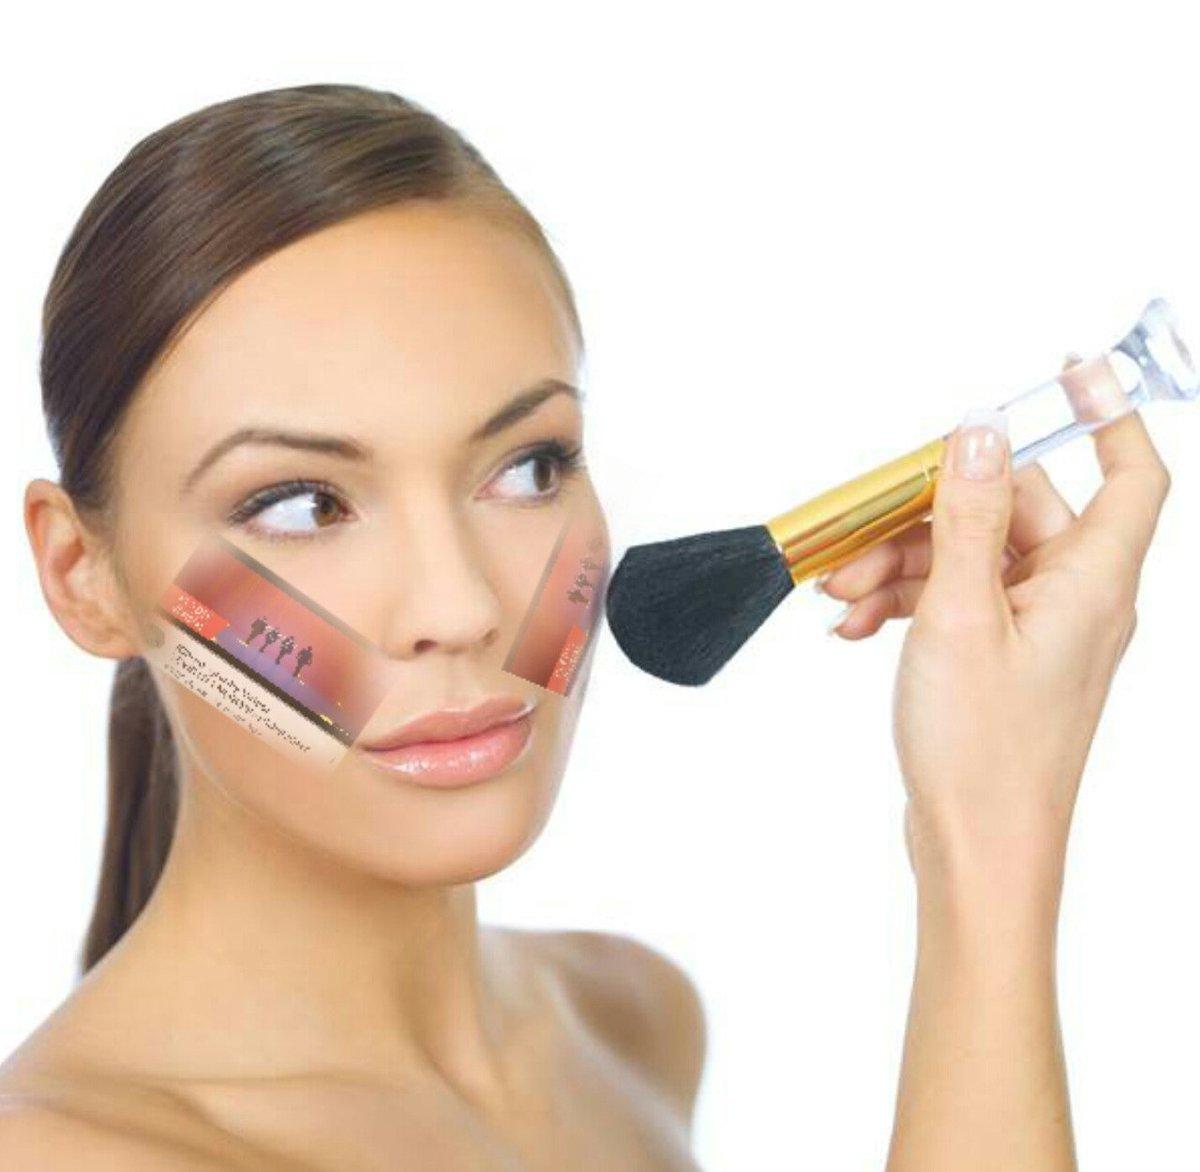 the art of applying make up essay